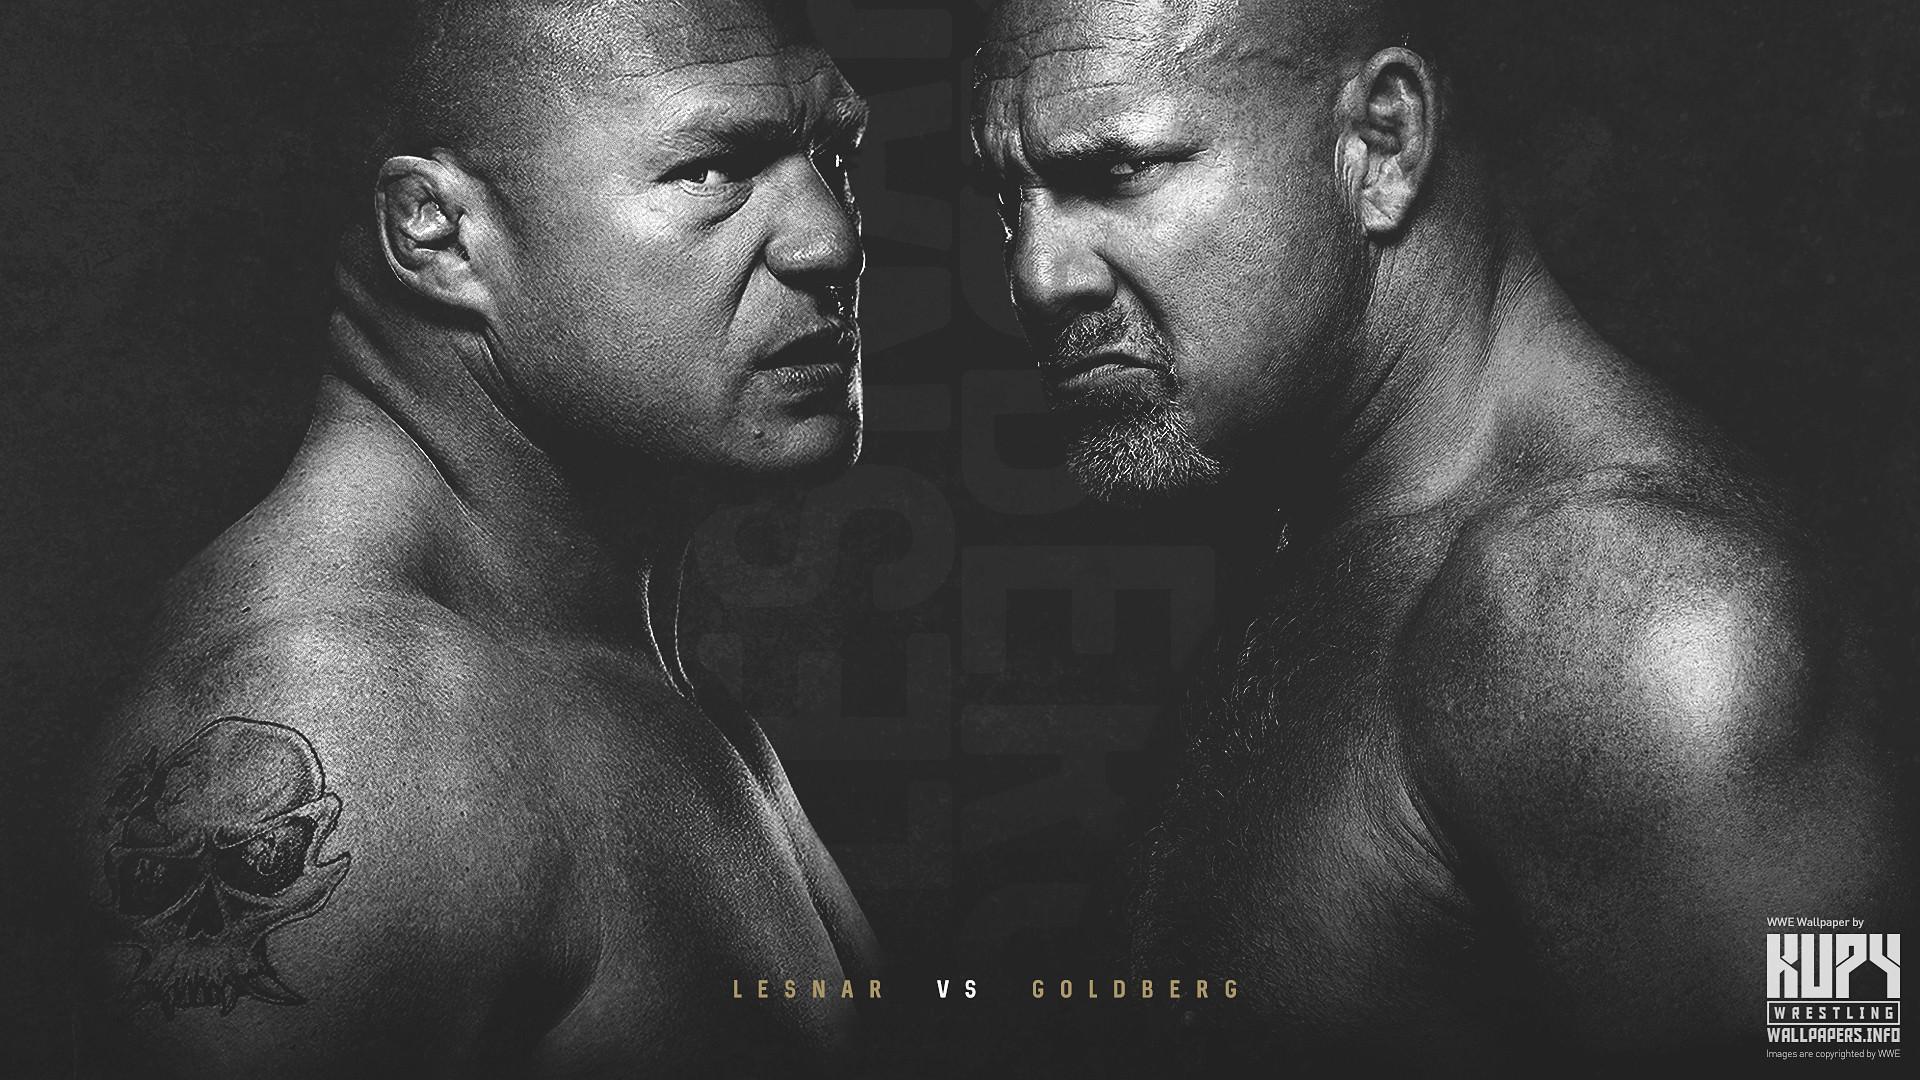 Brock lesnar wallpapers 2016 wallpaper cave - Goldberg images hd ...